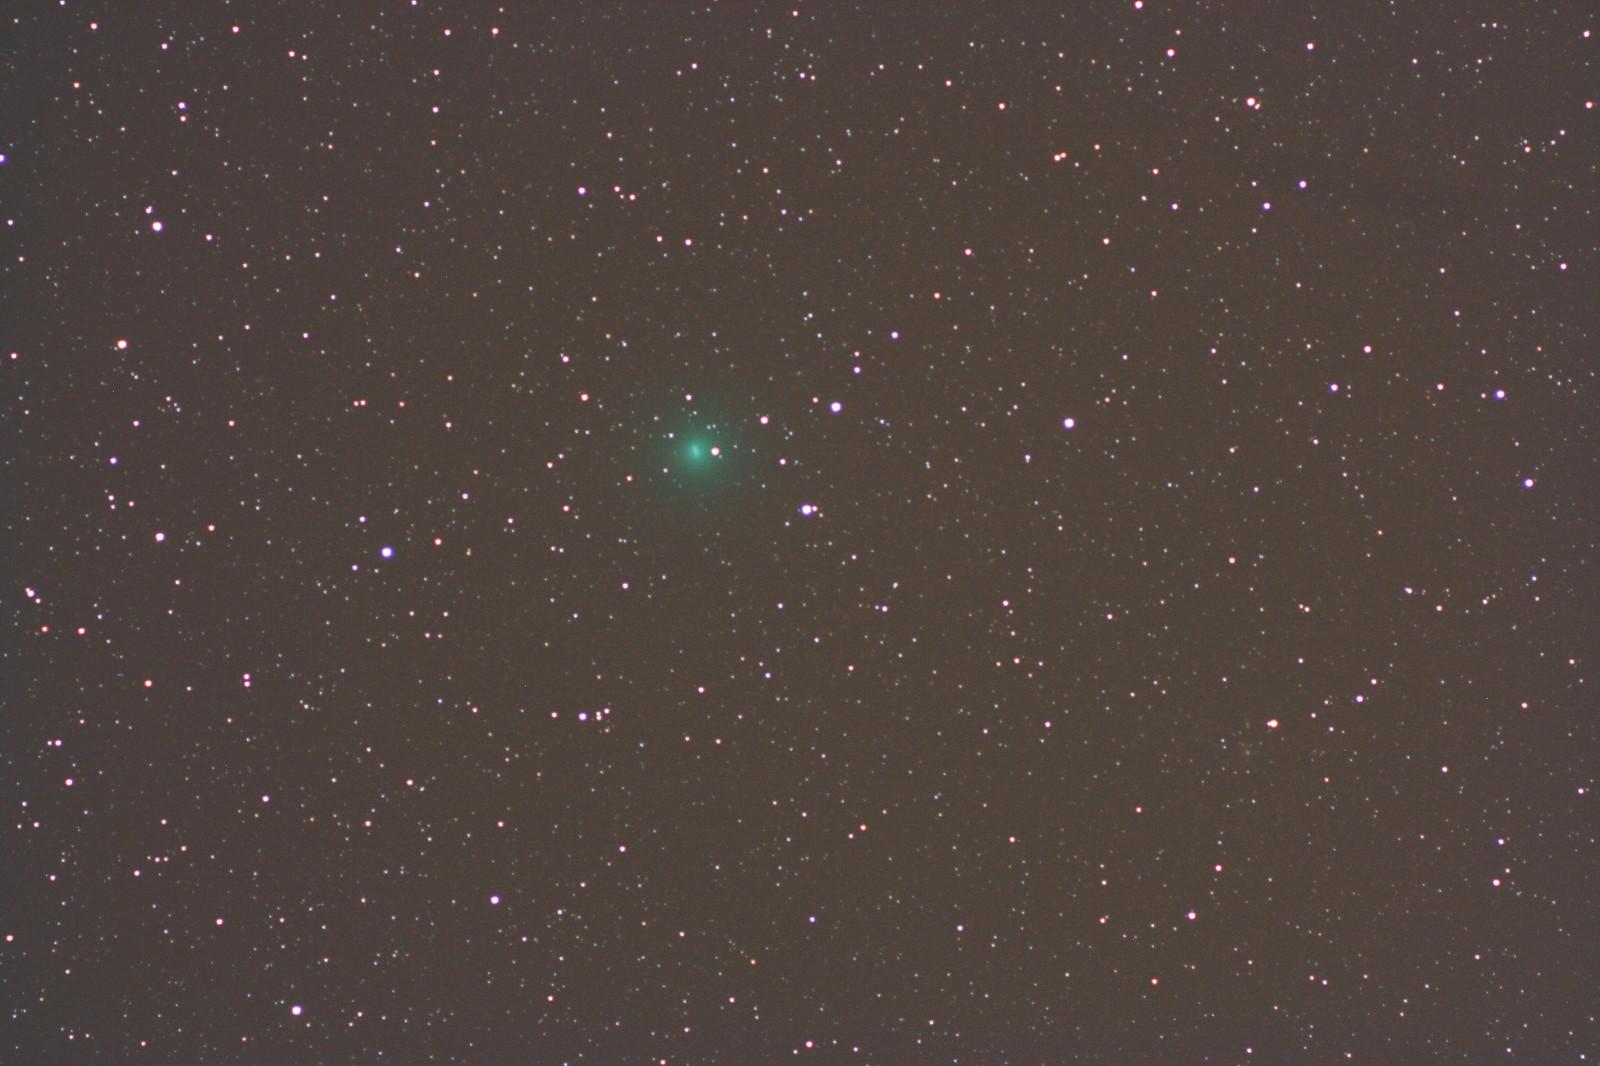 Cometa Tuttle in Andromeda